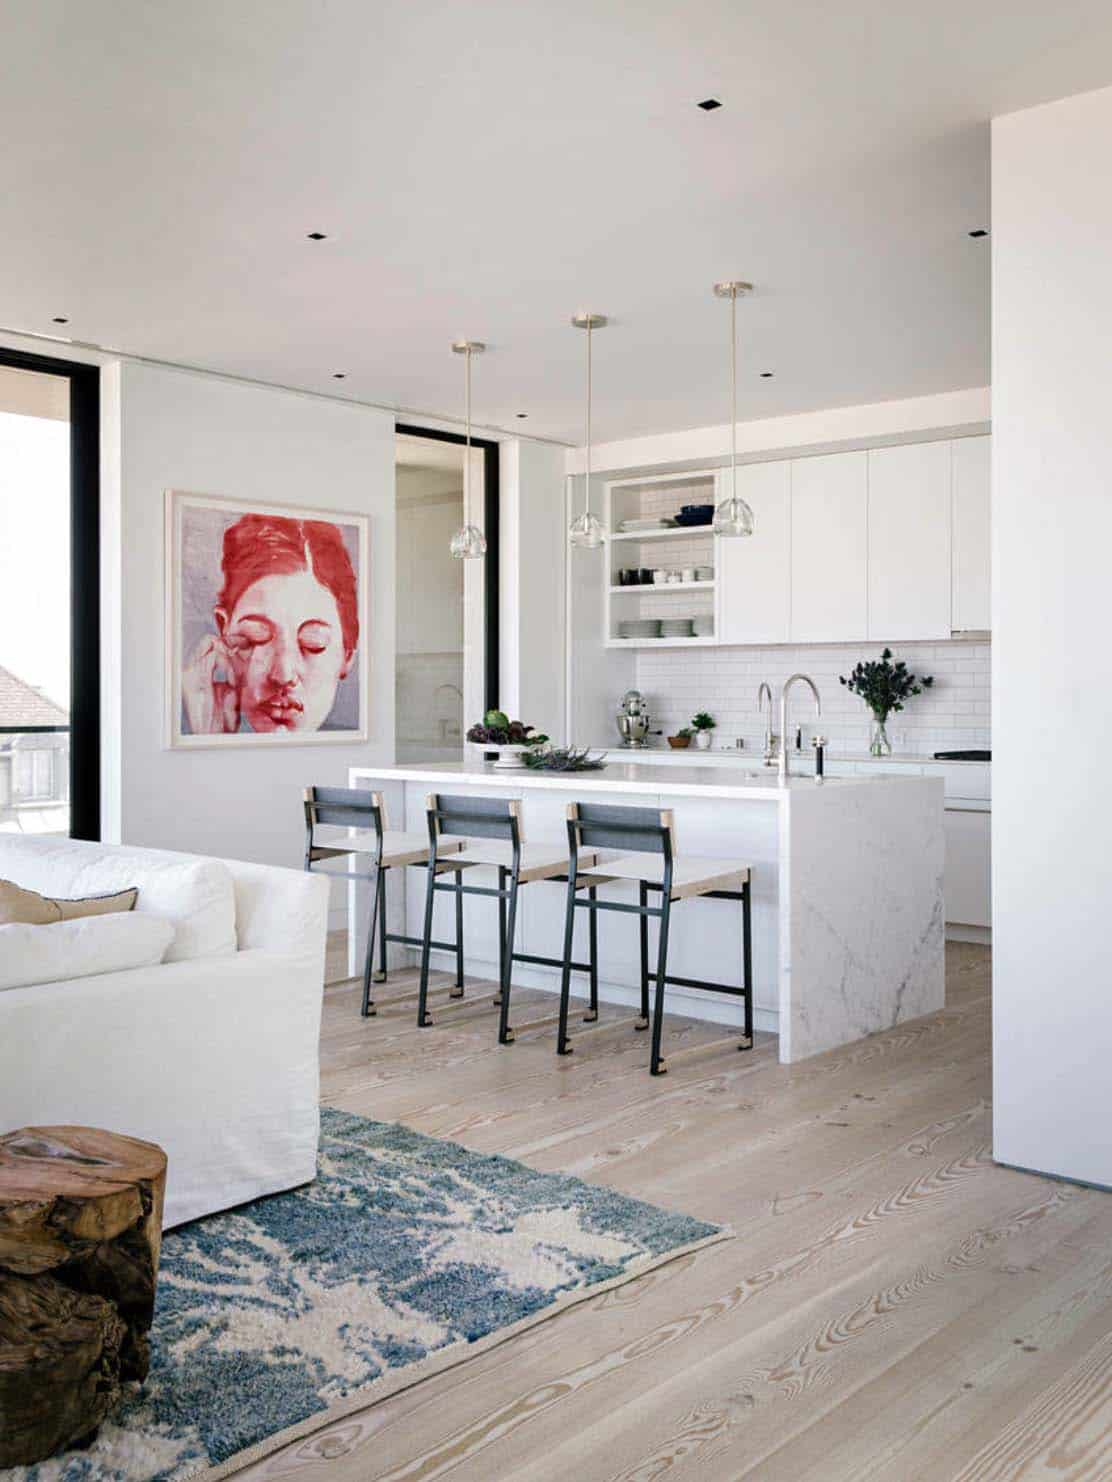 Mid-Century Modern Home-John Maniscalco Architecture-22-1 Kindesign